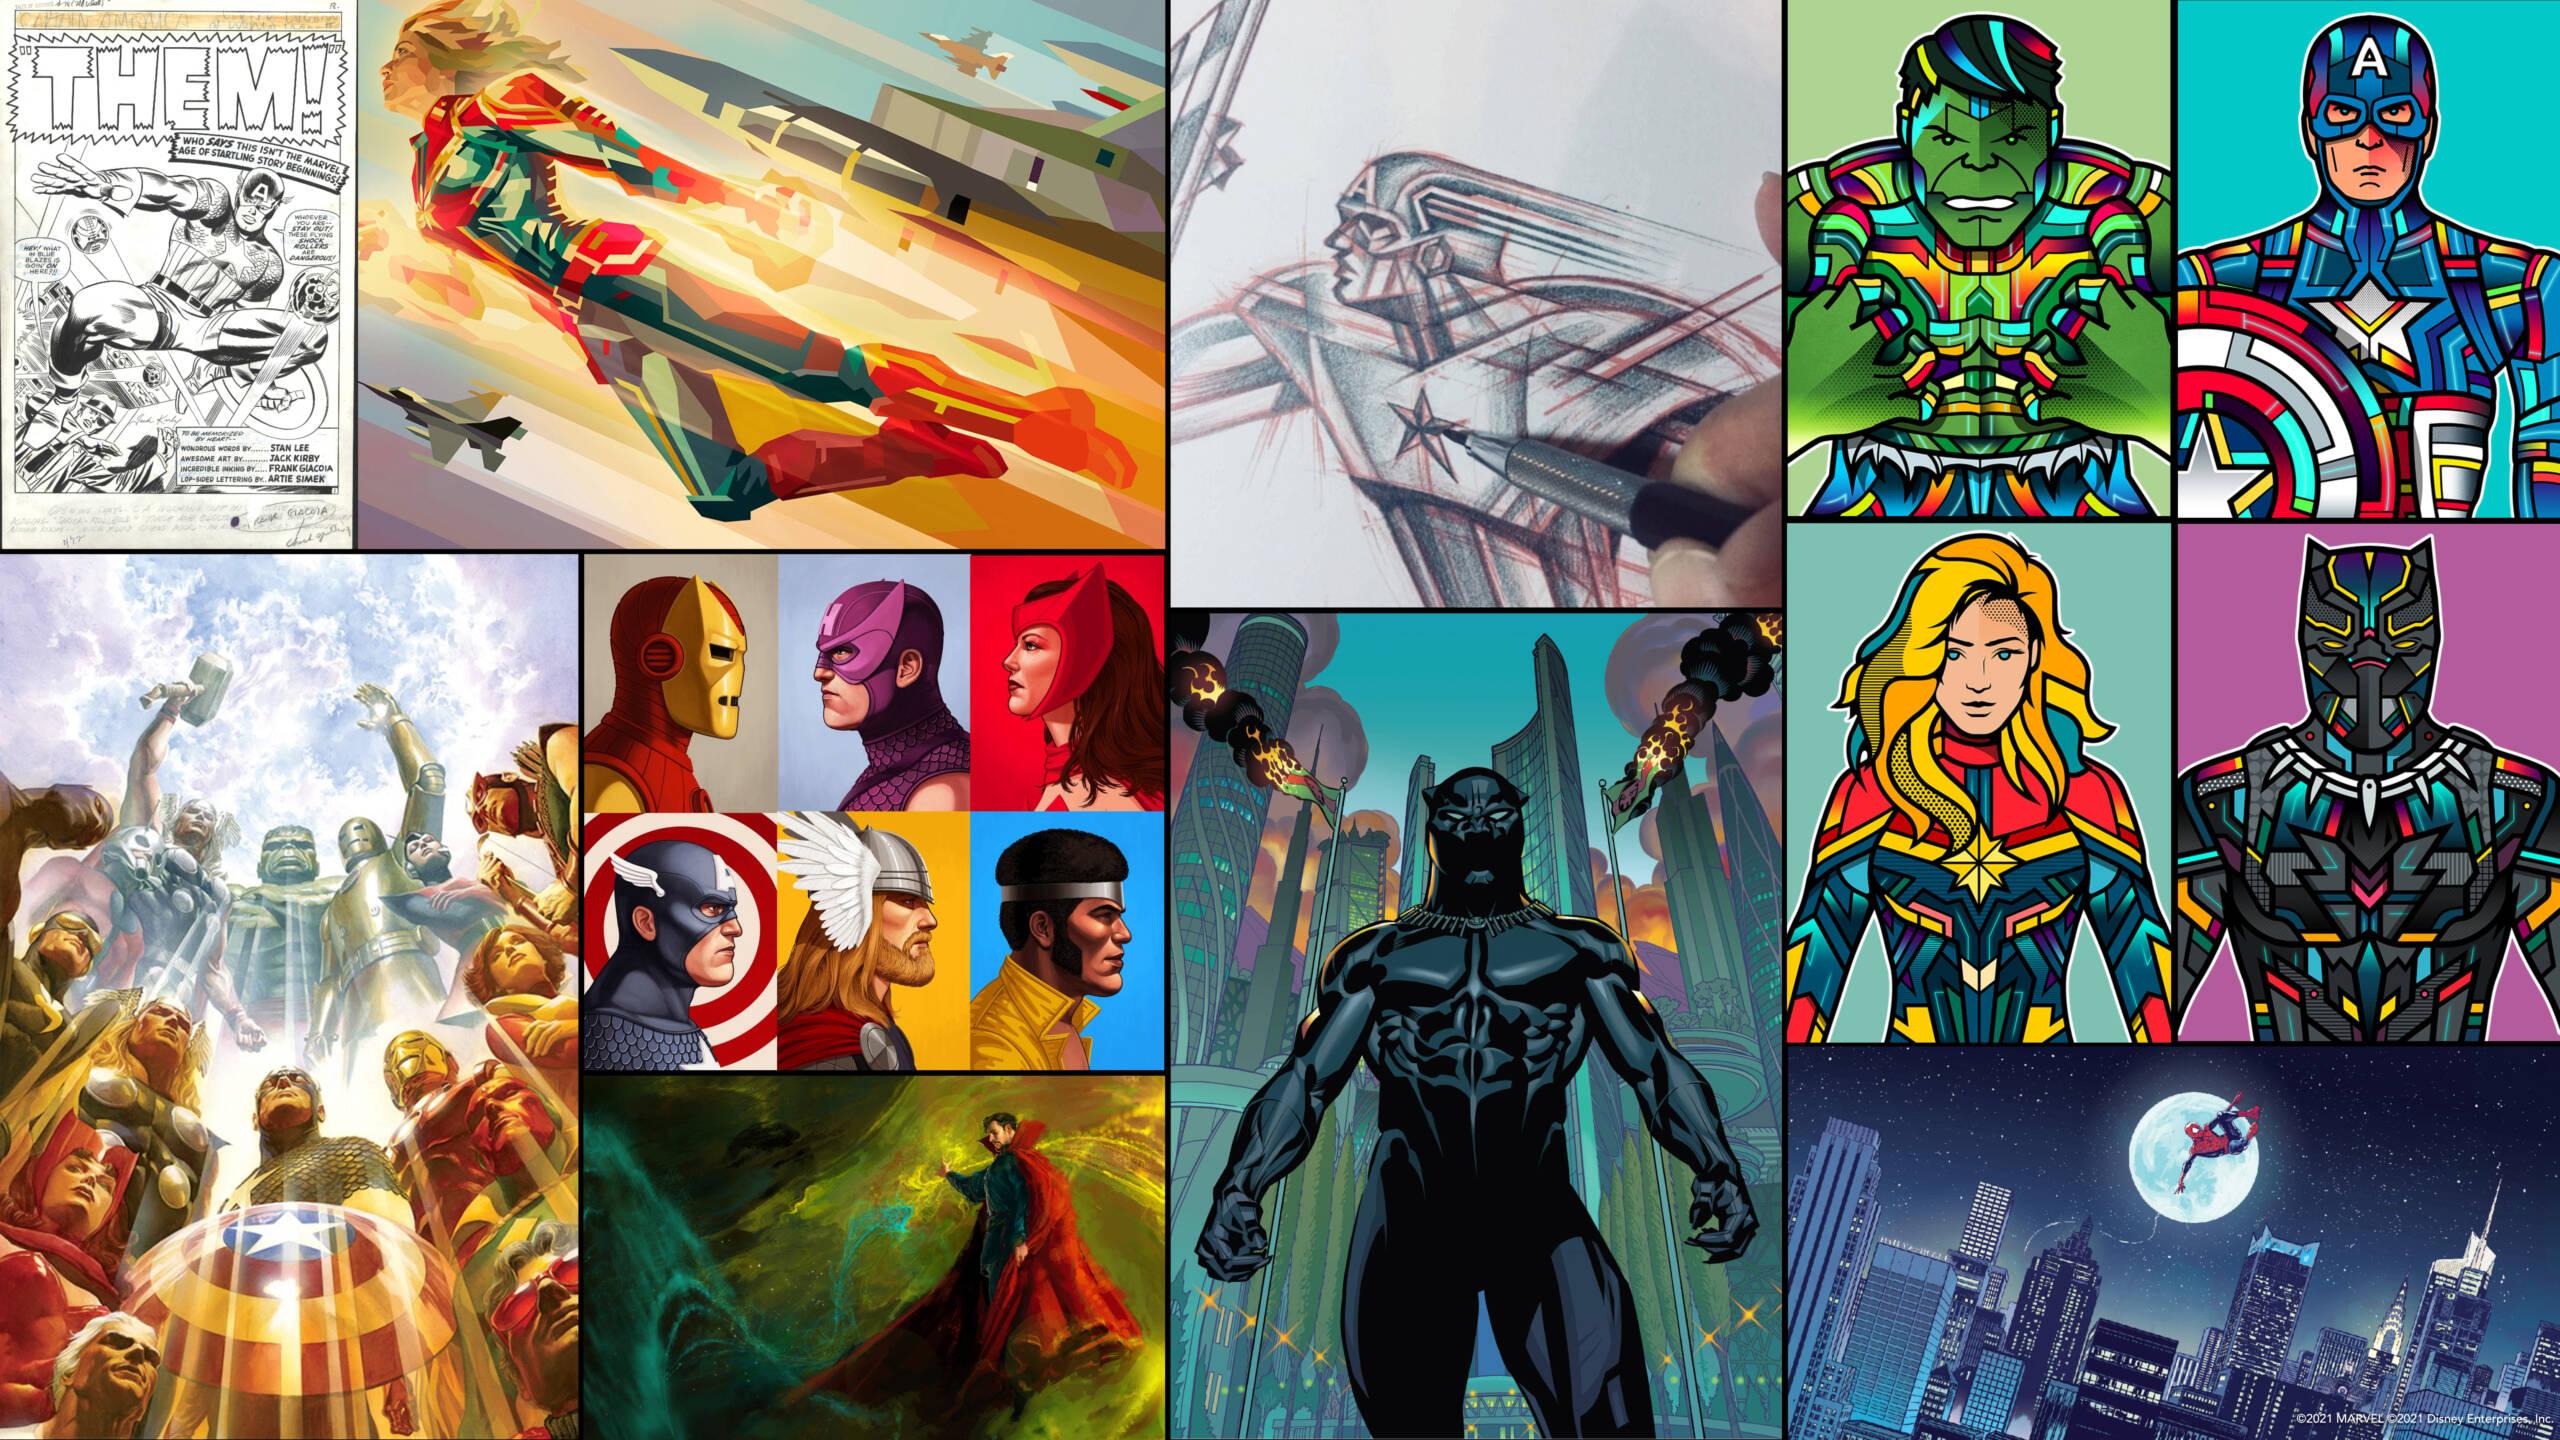 Disney's Hotel New York - The Art of Marvel - Pagina 2 Divers10